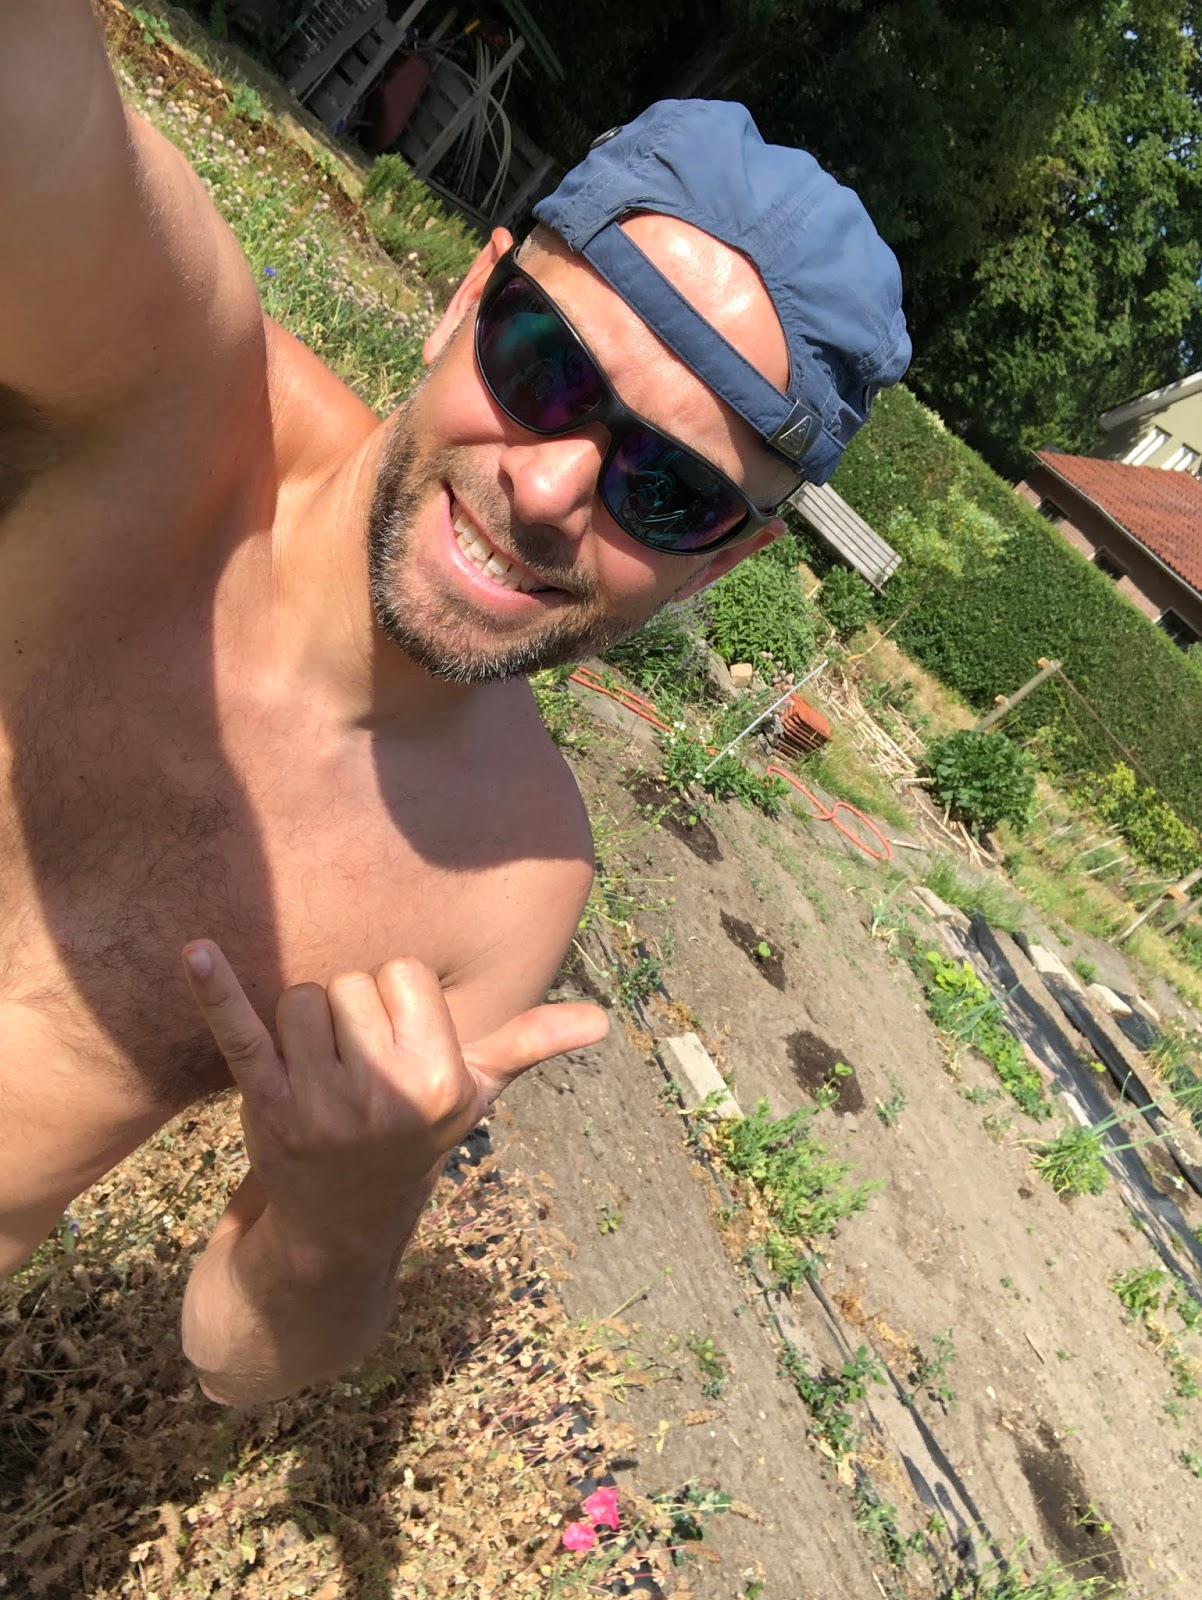 moestuin droogte moestuin volkstuin 2020 selfie